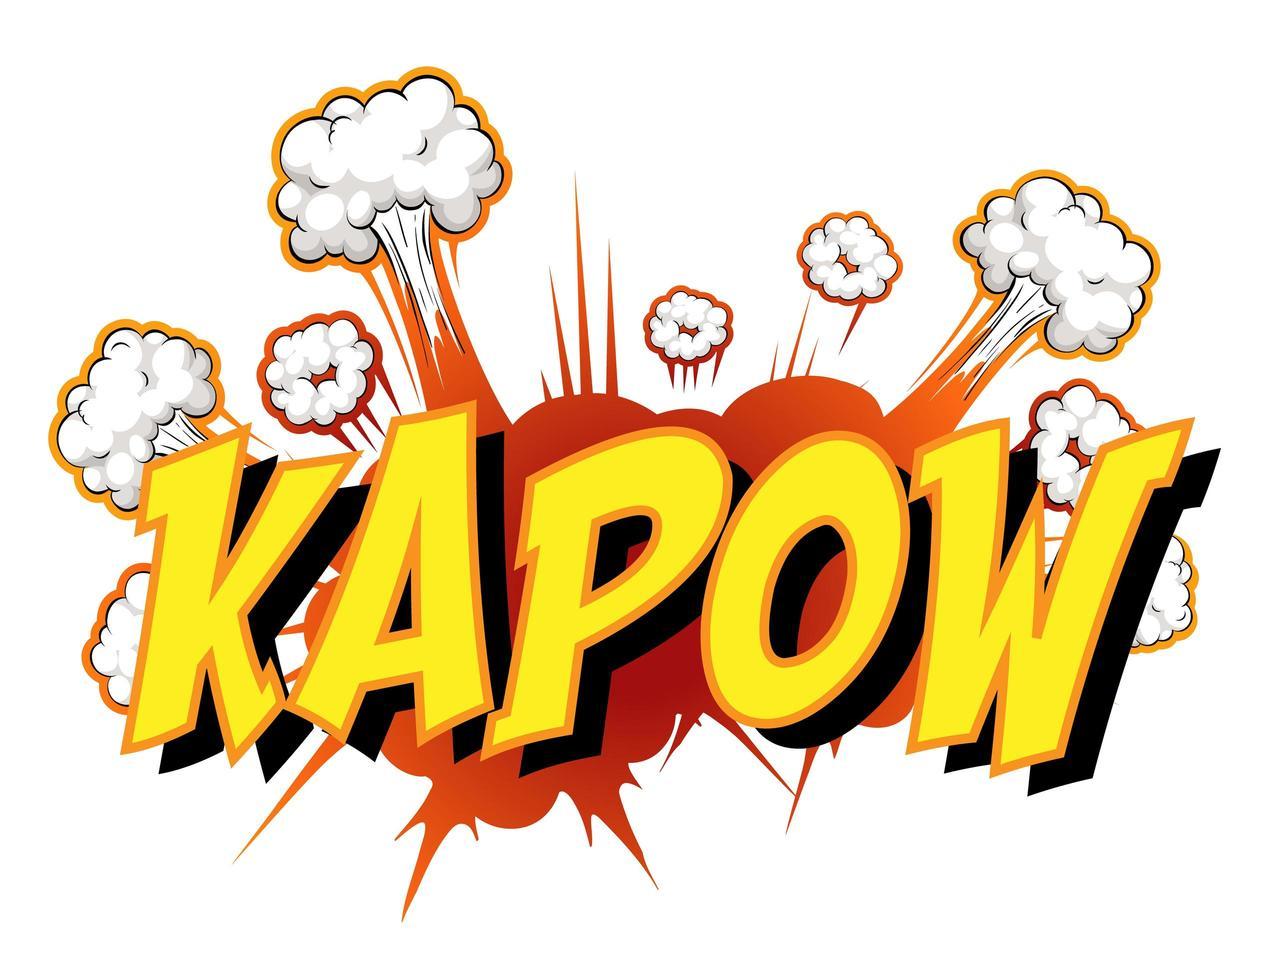 komisk pratbubbla med kapow-text vektor